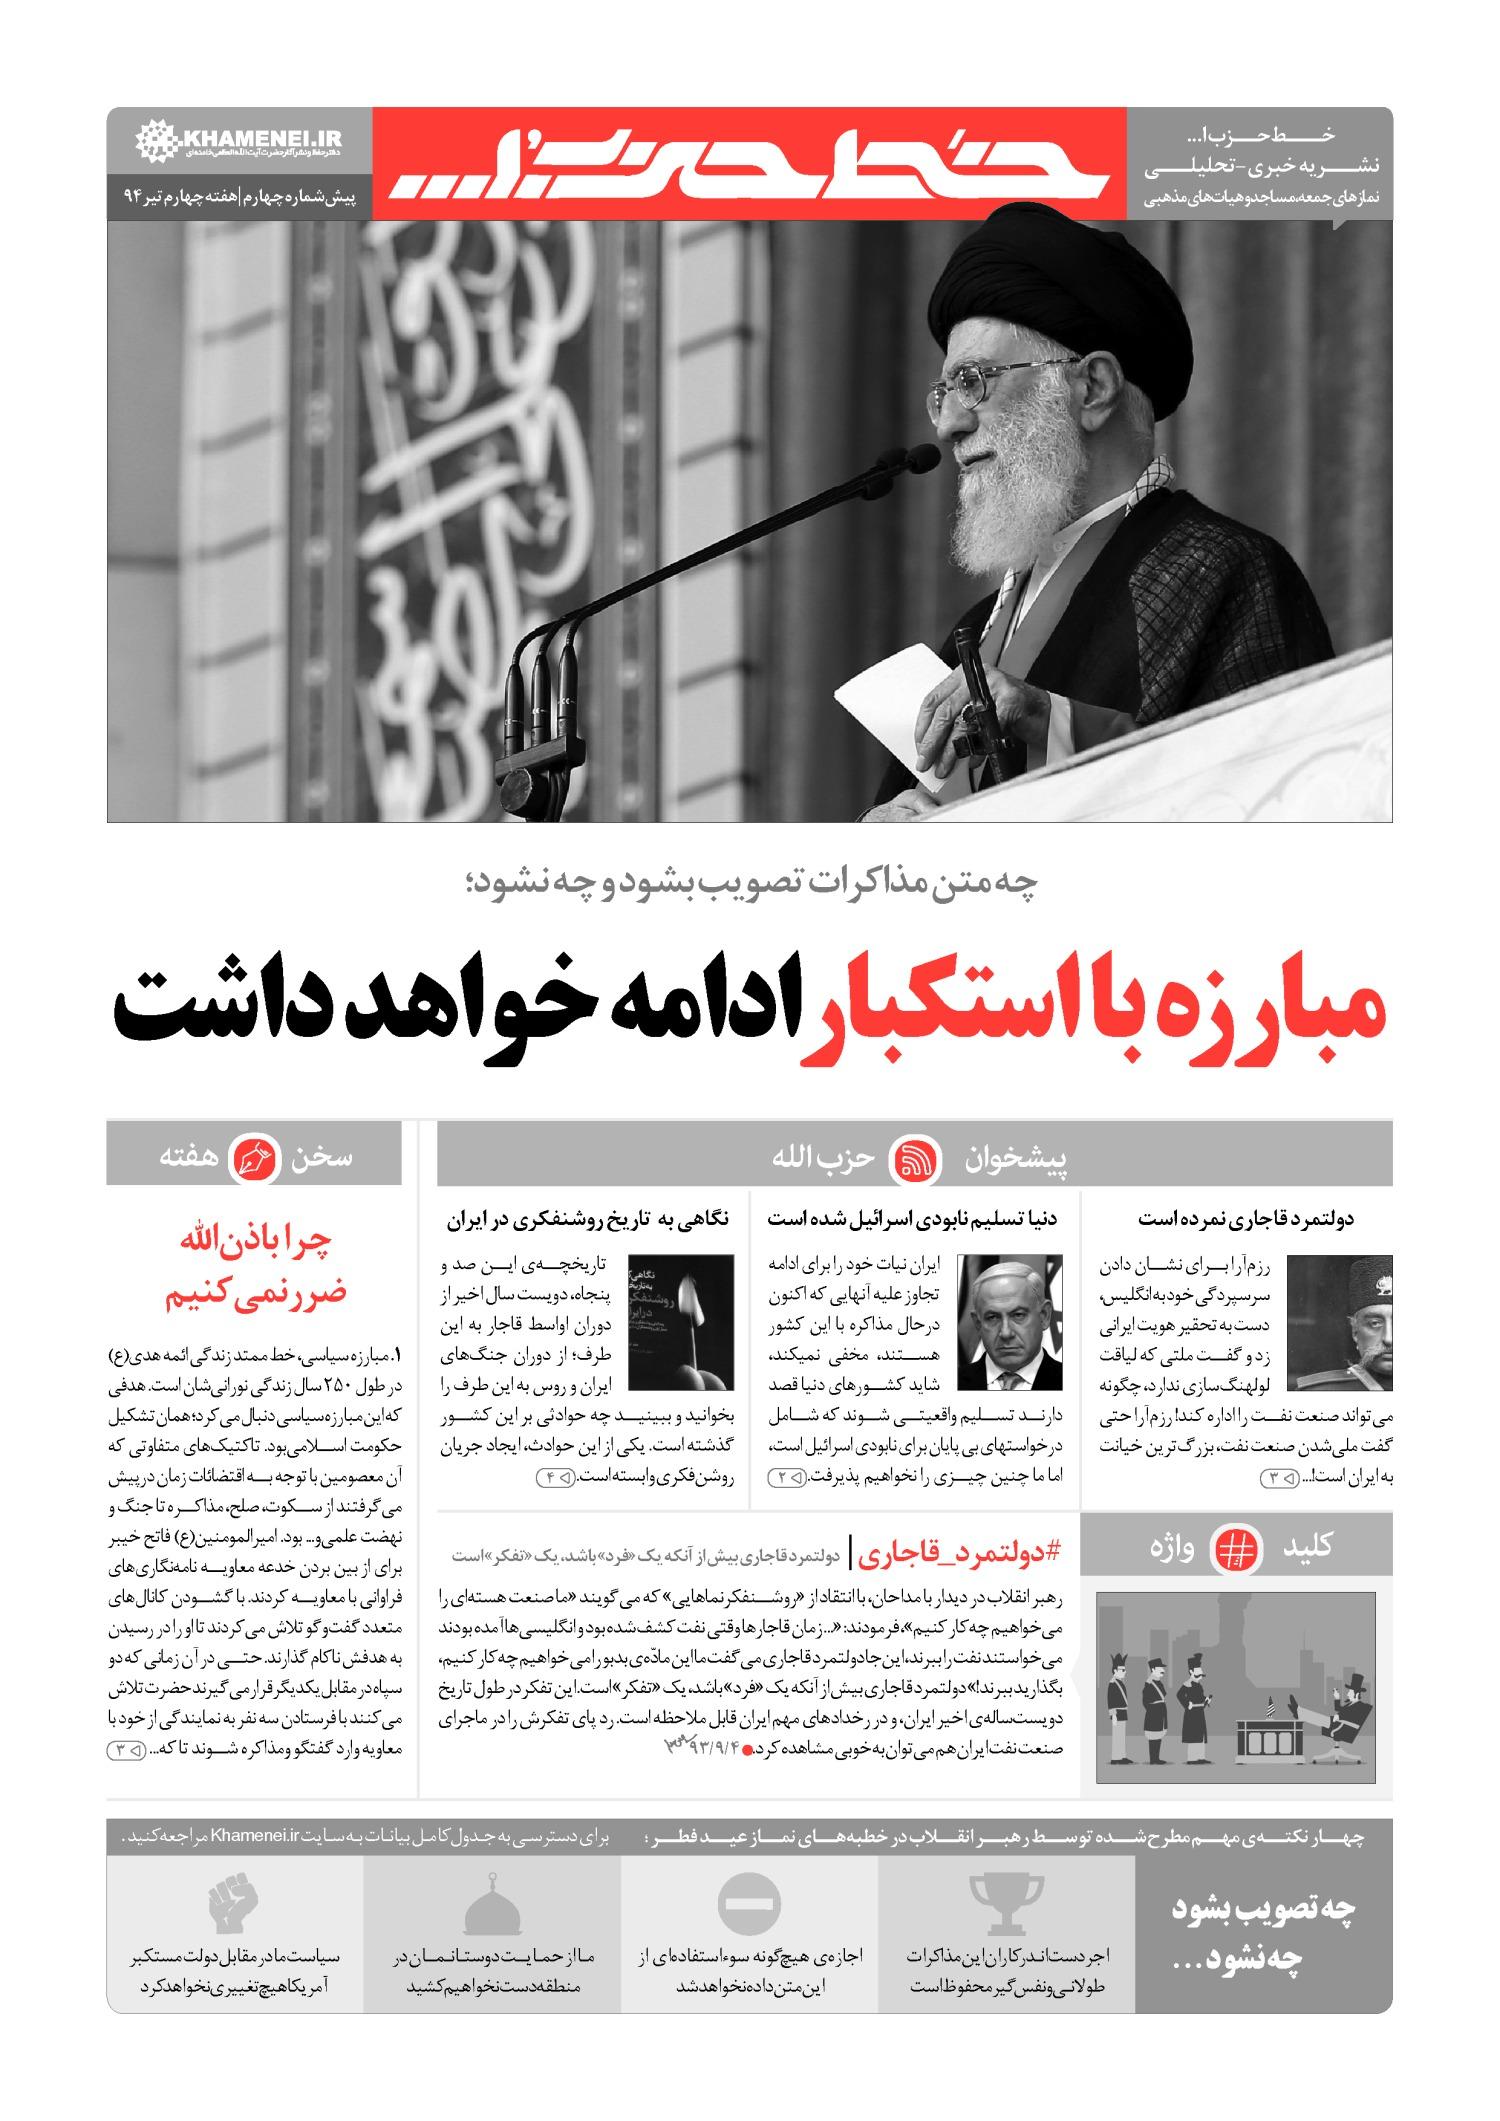 خط حزب الله -پیش شماره چهارم page large 11